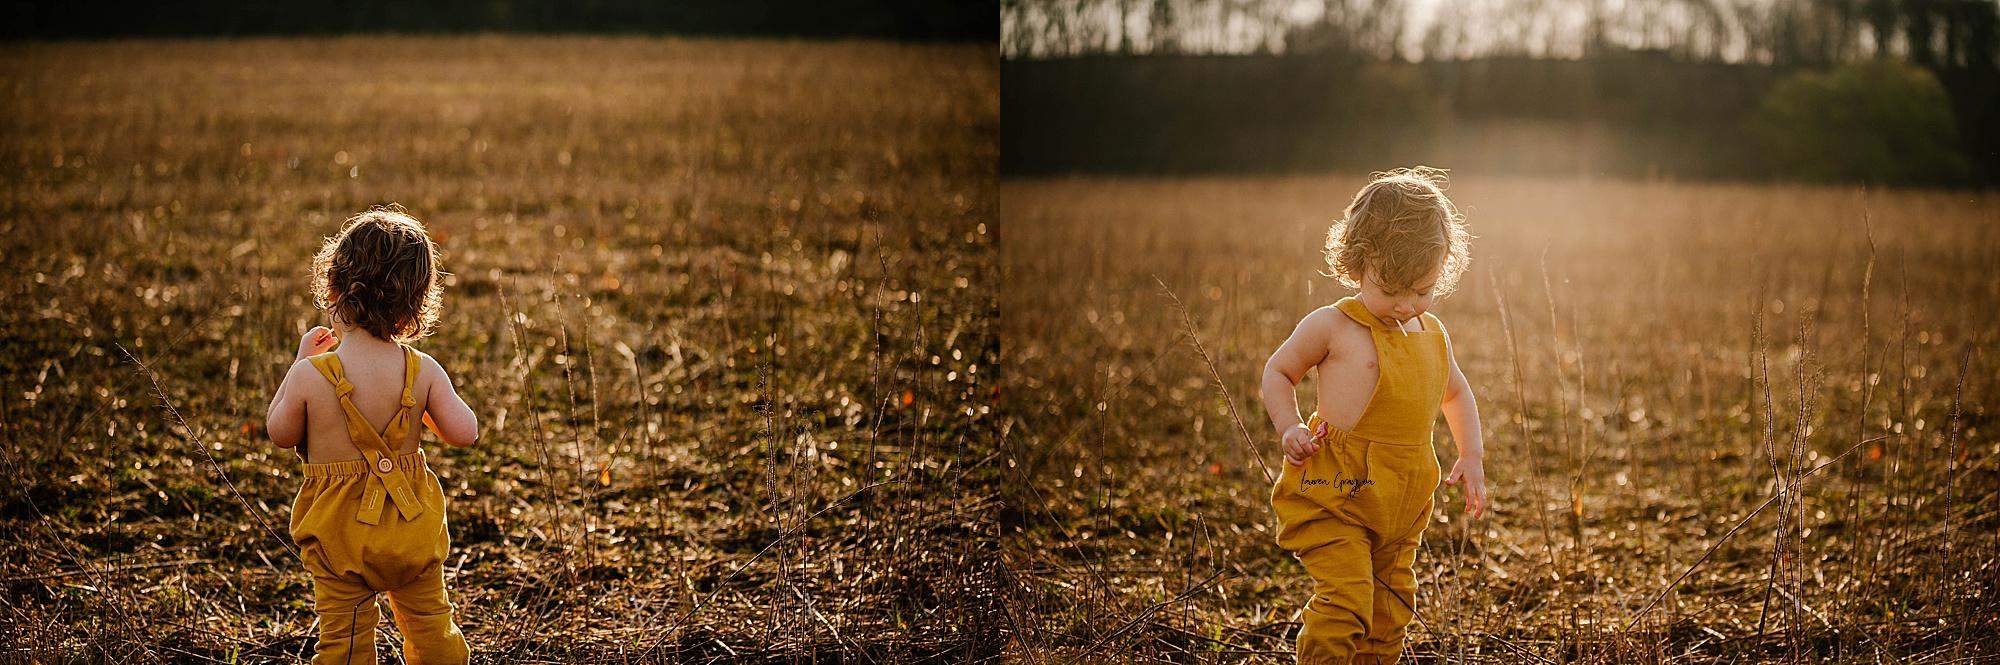 lauren-grayson-photography-akron-ohio-family-mom-boys-field-spring-outdoor-session_0029.jpg